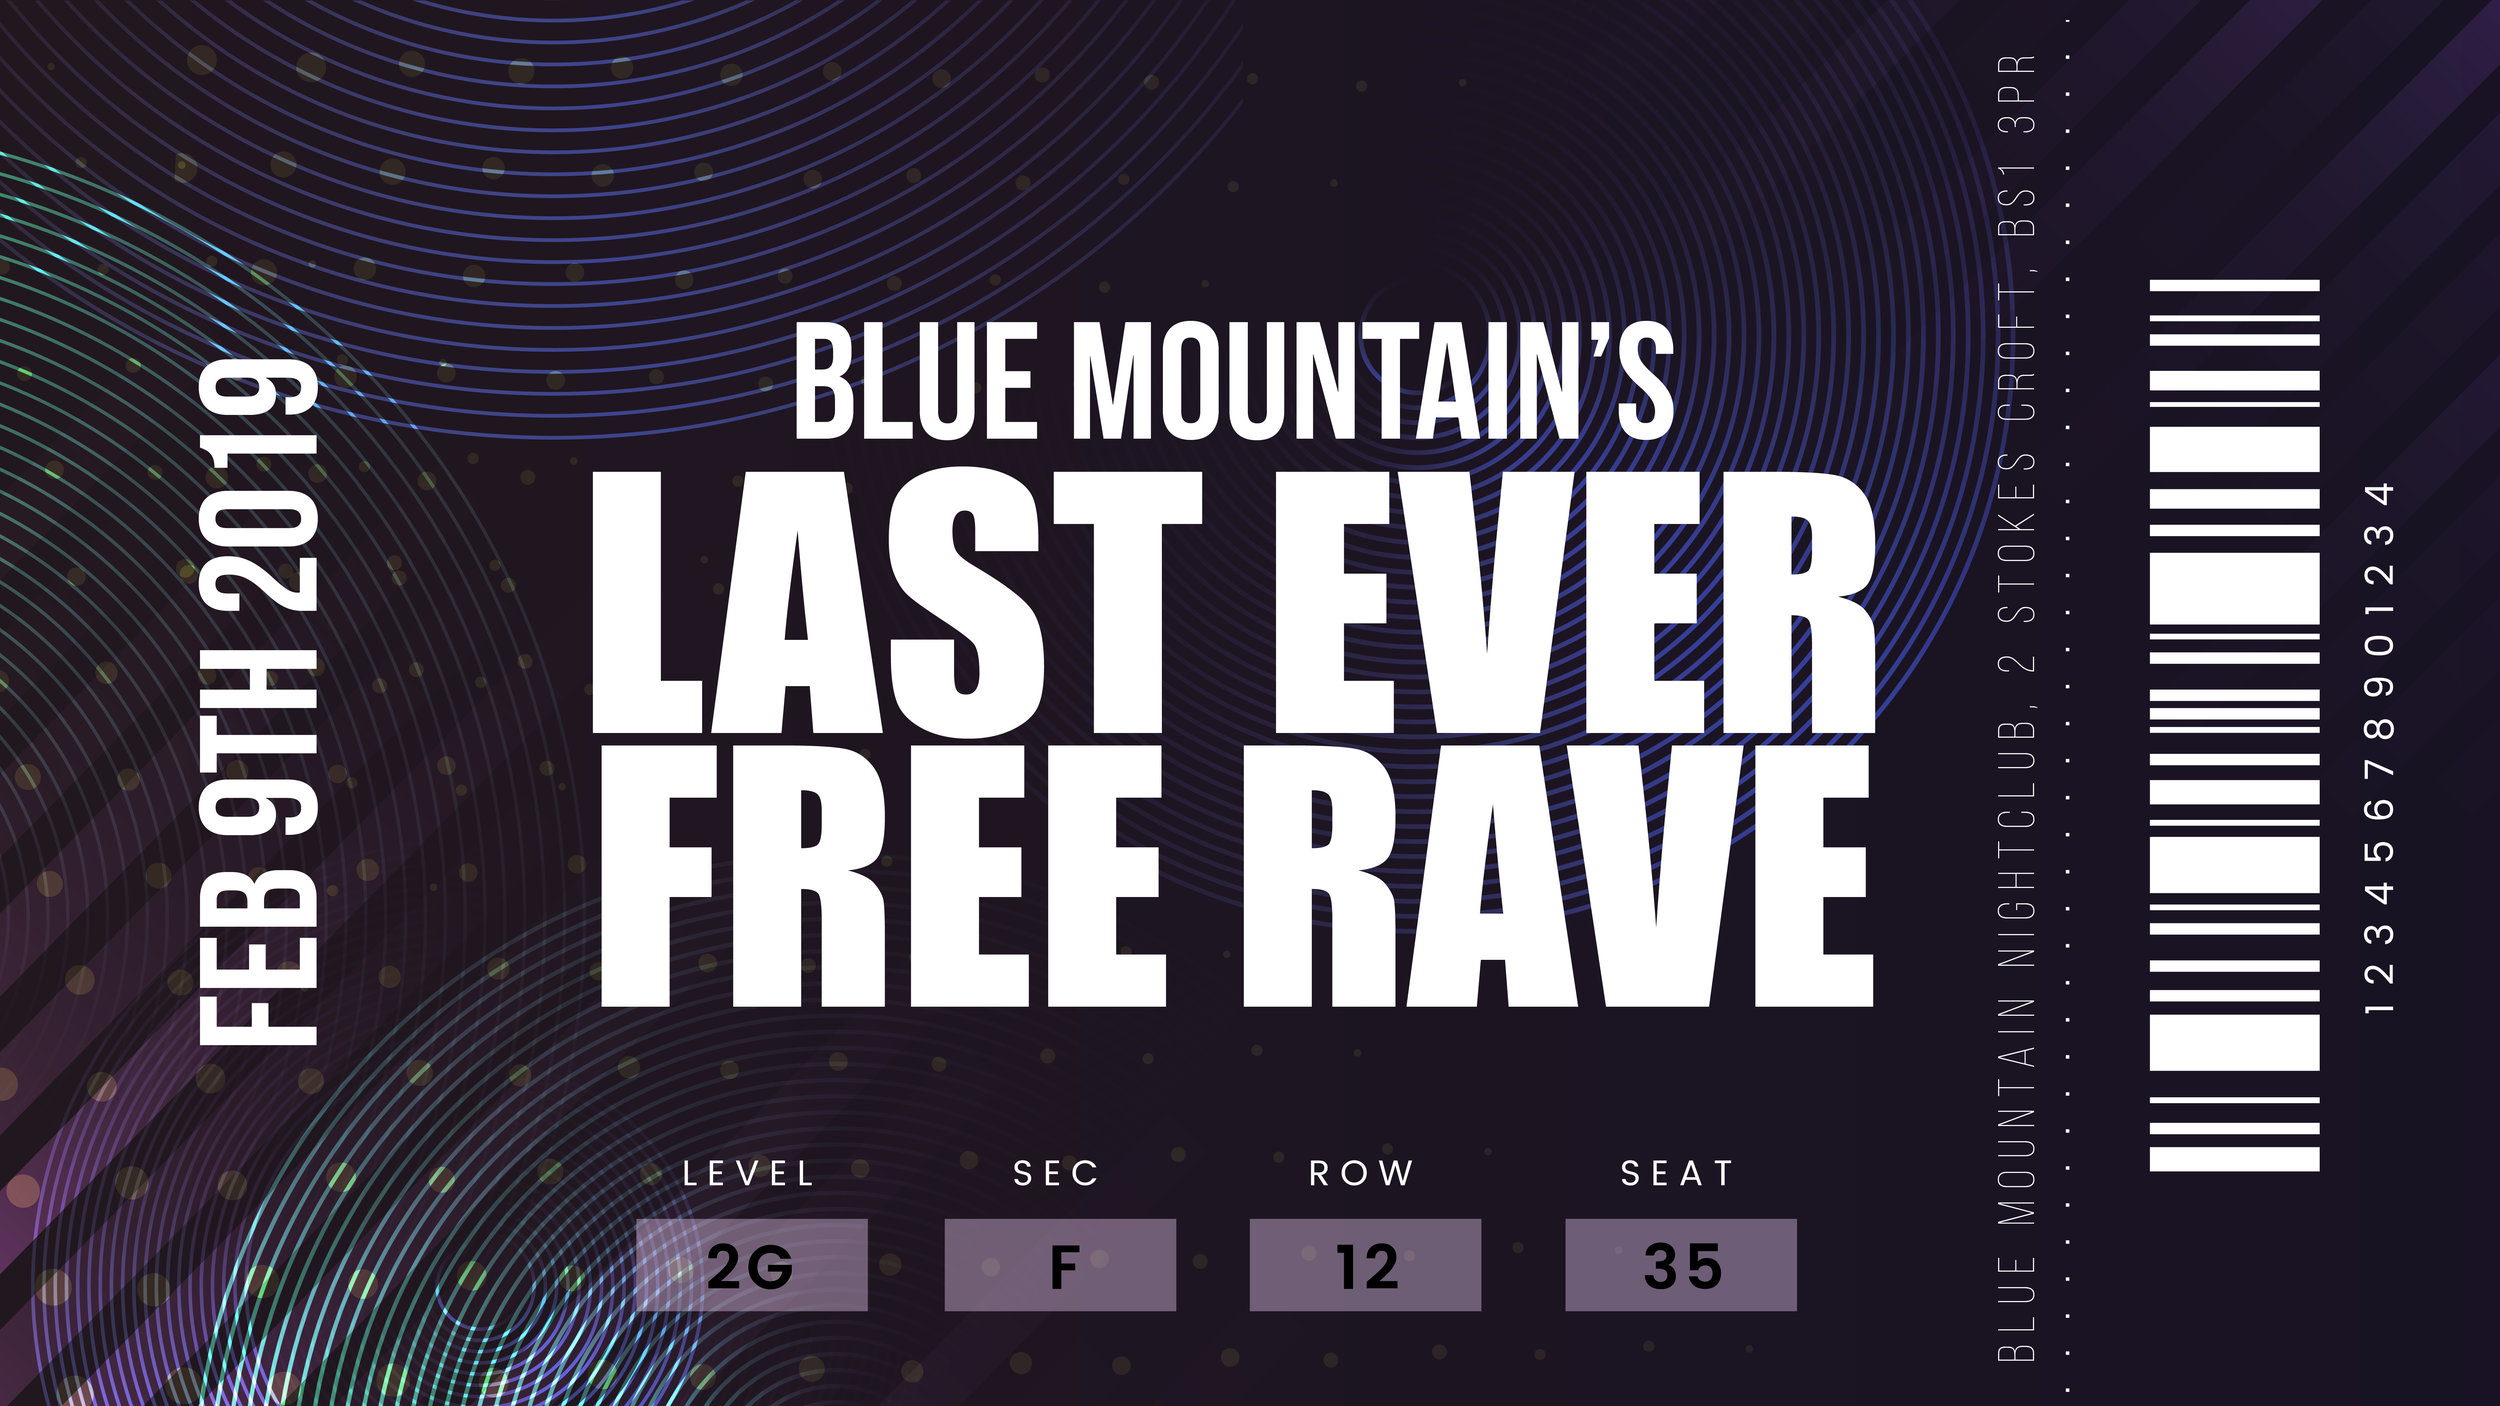 BM FREE RAVE ART 3-01.jpg